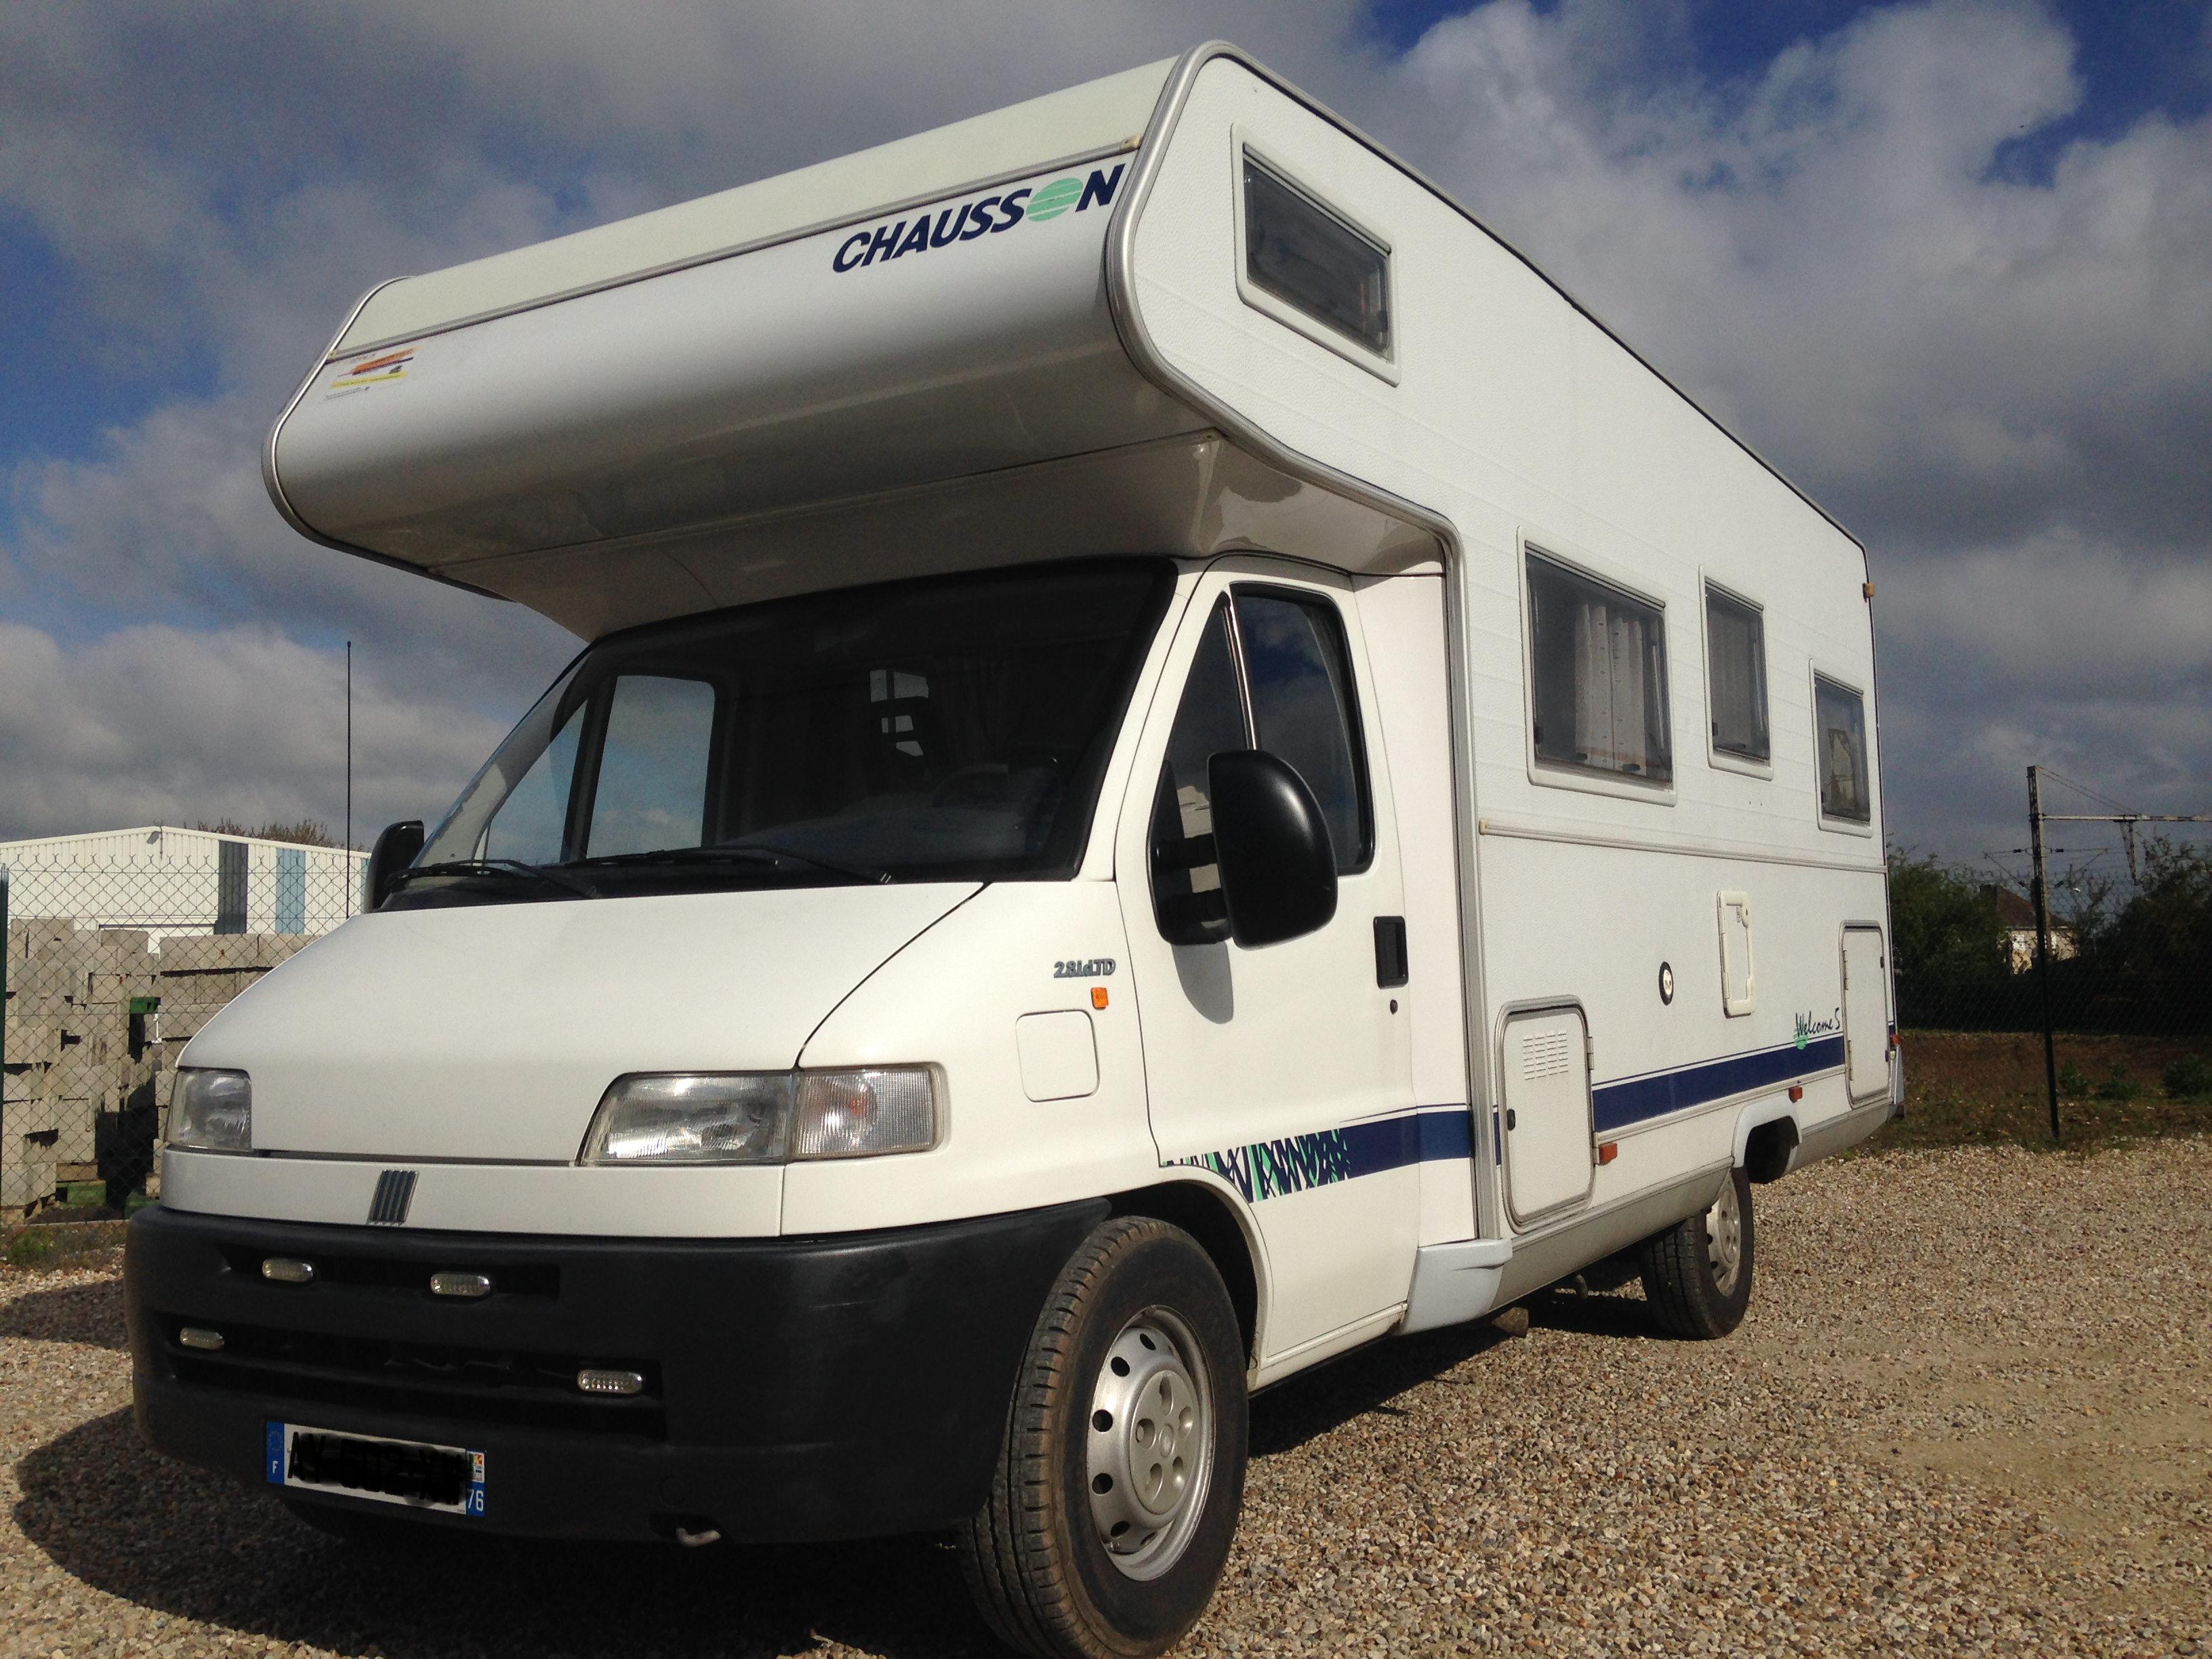 chausson welcome 5 occasion porteur ducato fiat ducato 2 8 idtd camping car vendre en eure. Black Bedroom Furniture Sets. Home Design Ideas